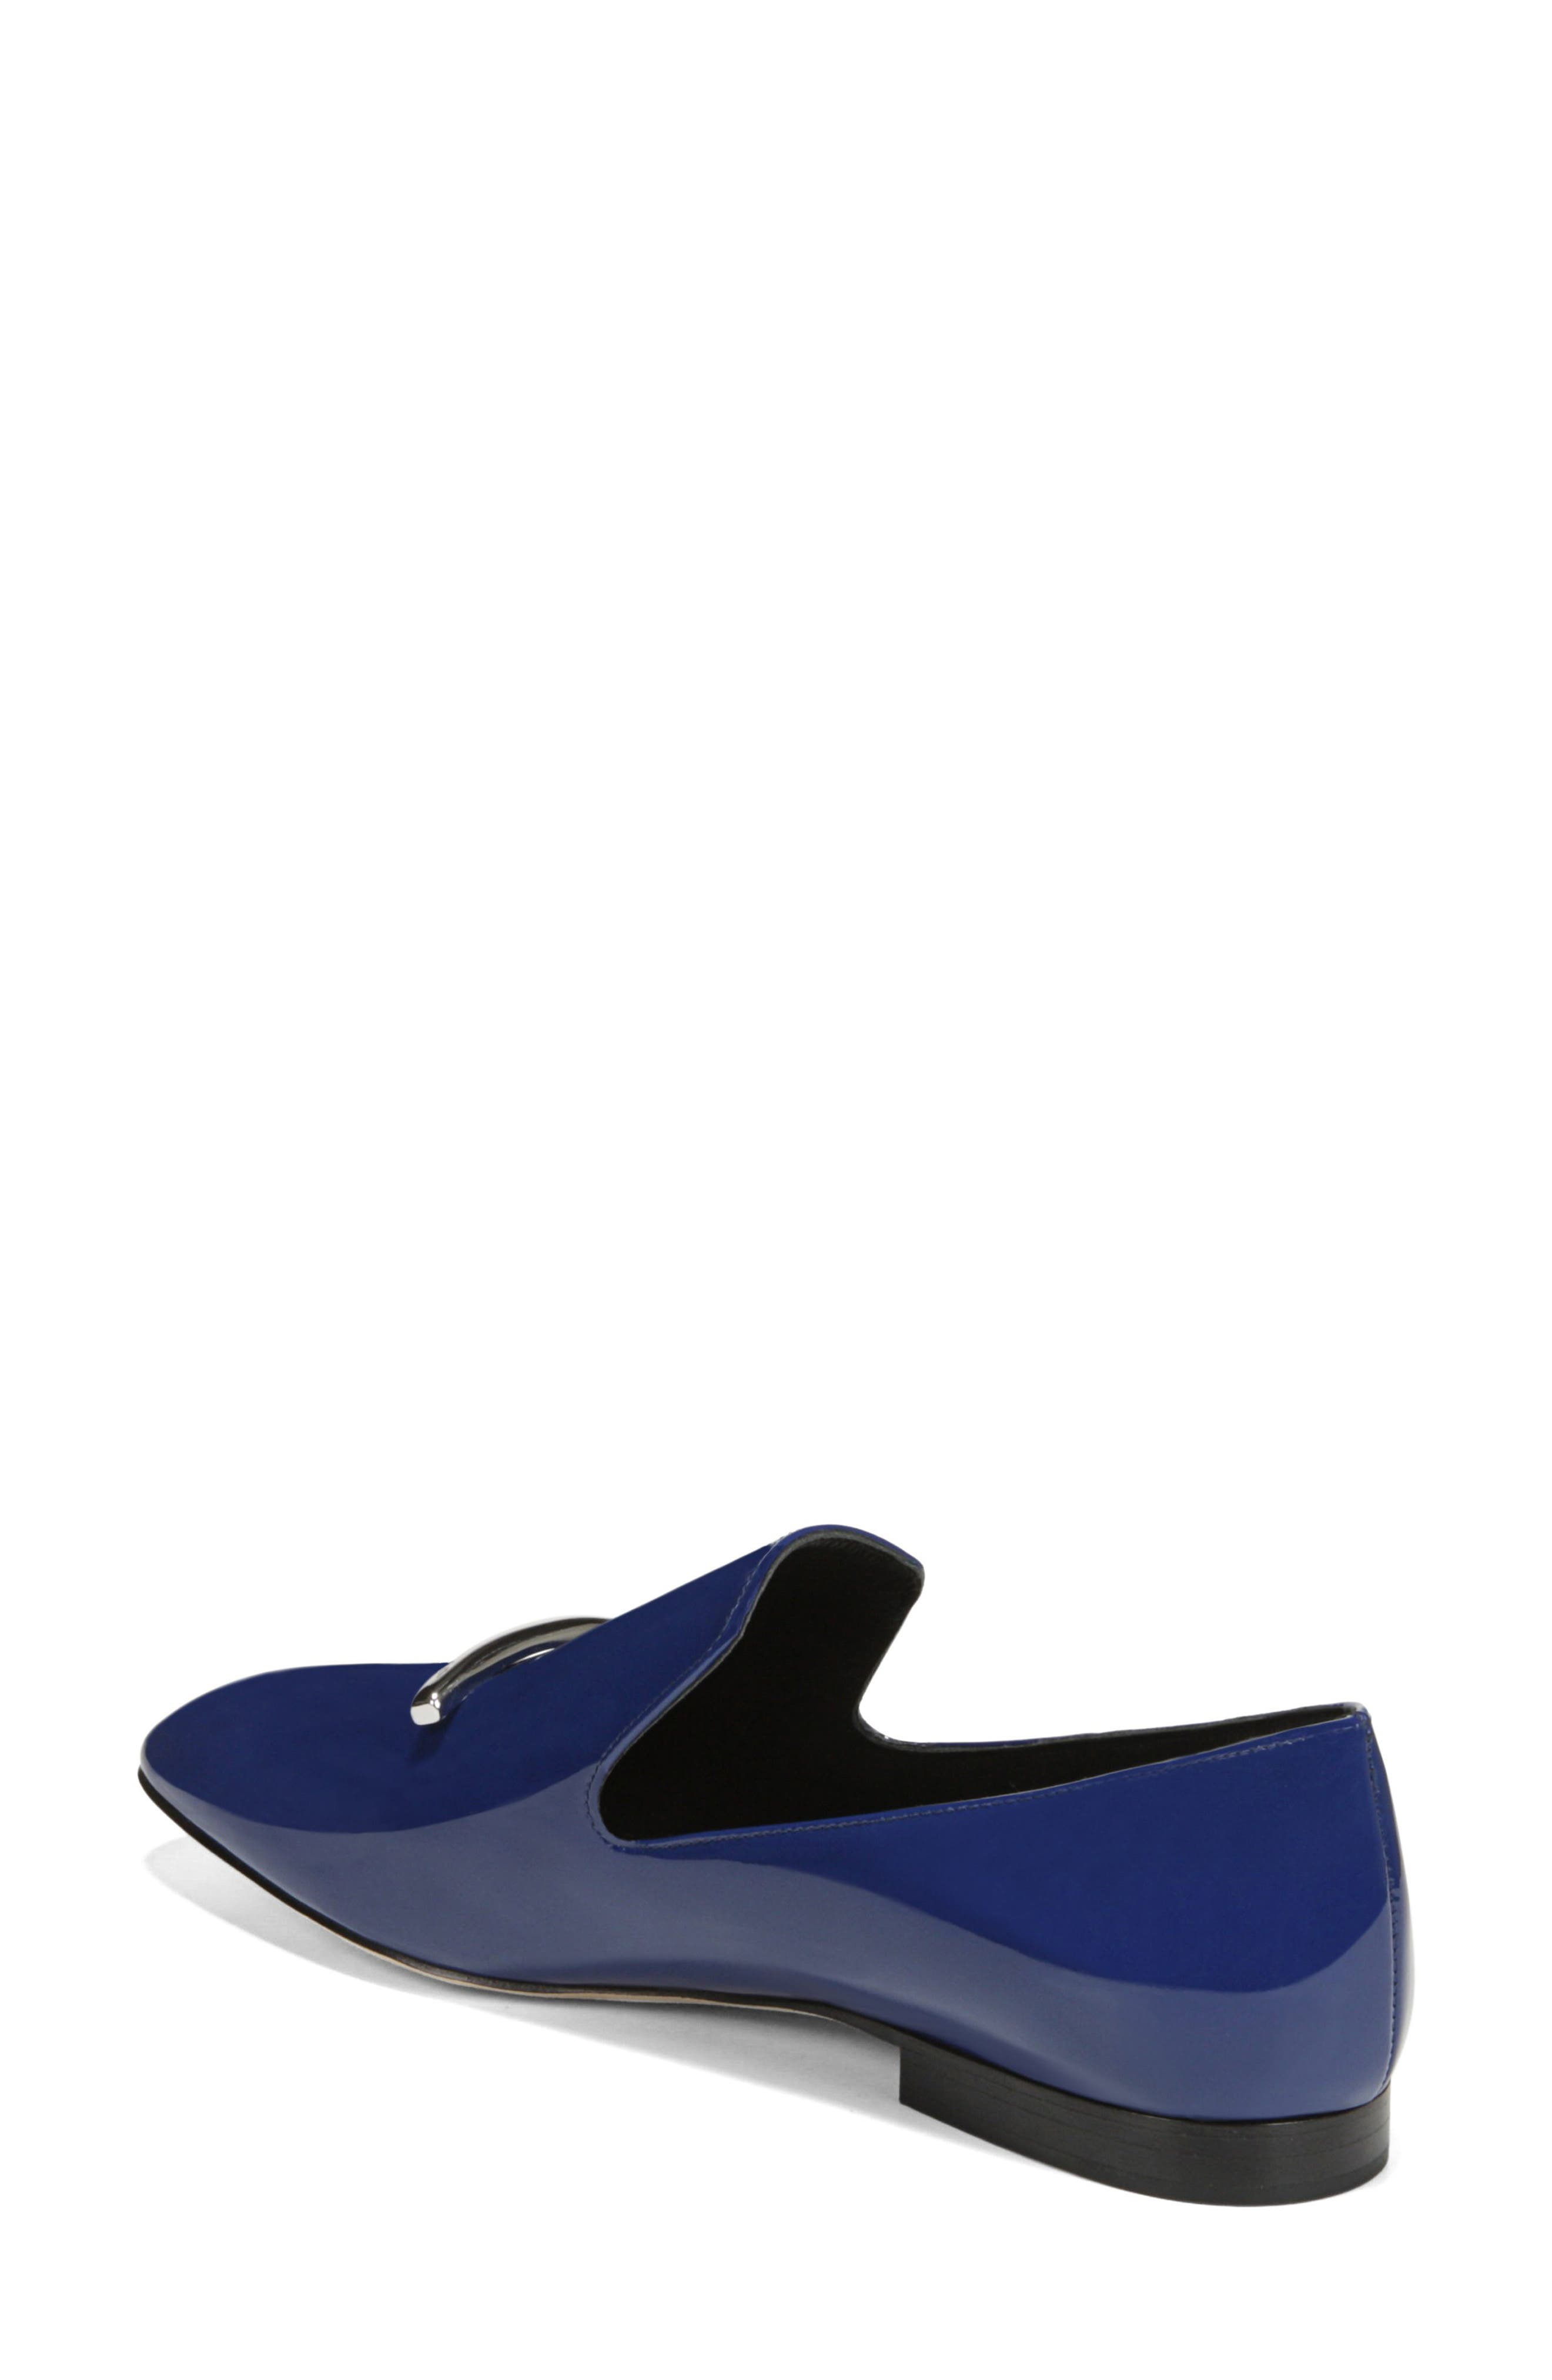 Tallis Flat Loafer,                             Alternate thumbnail 2, color,                             POP BLUE